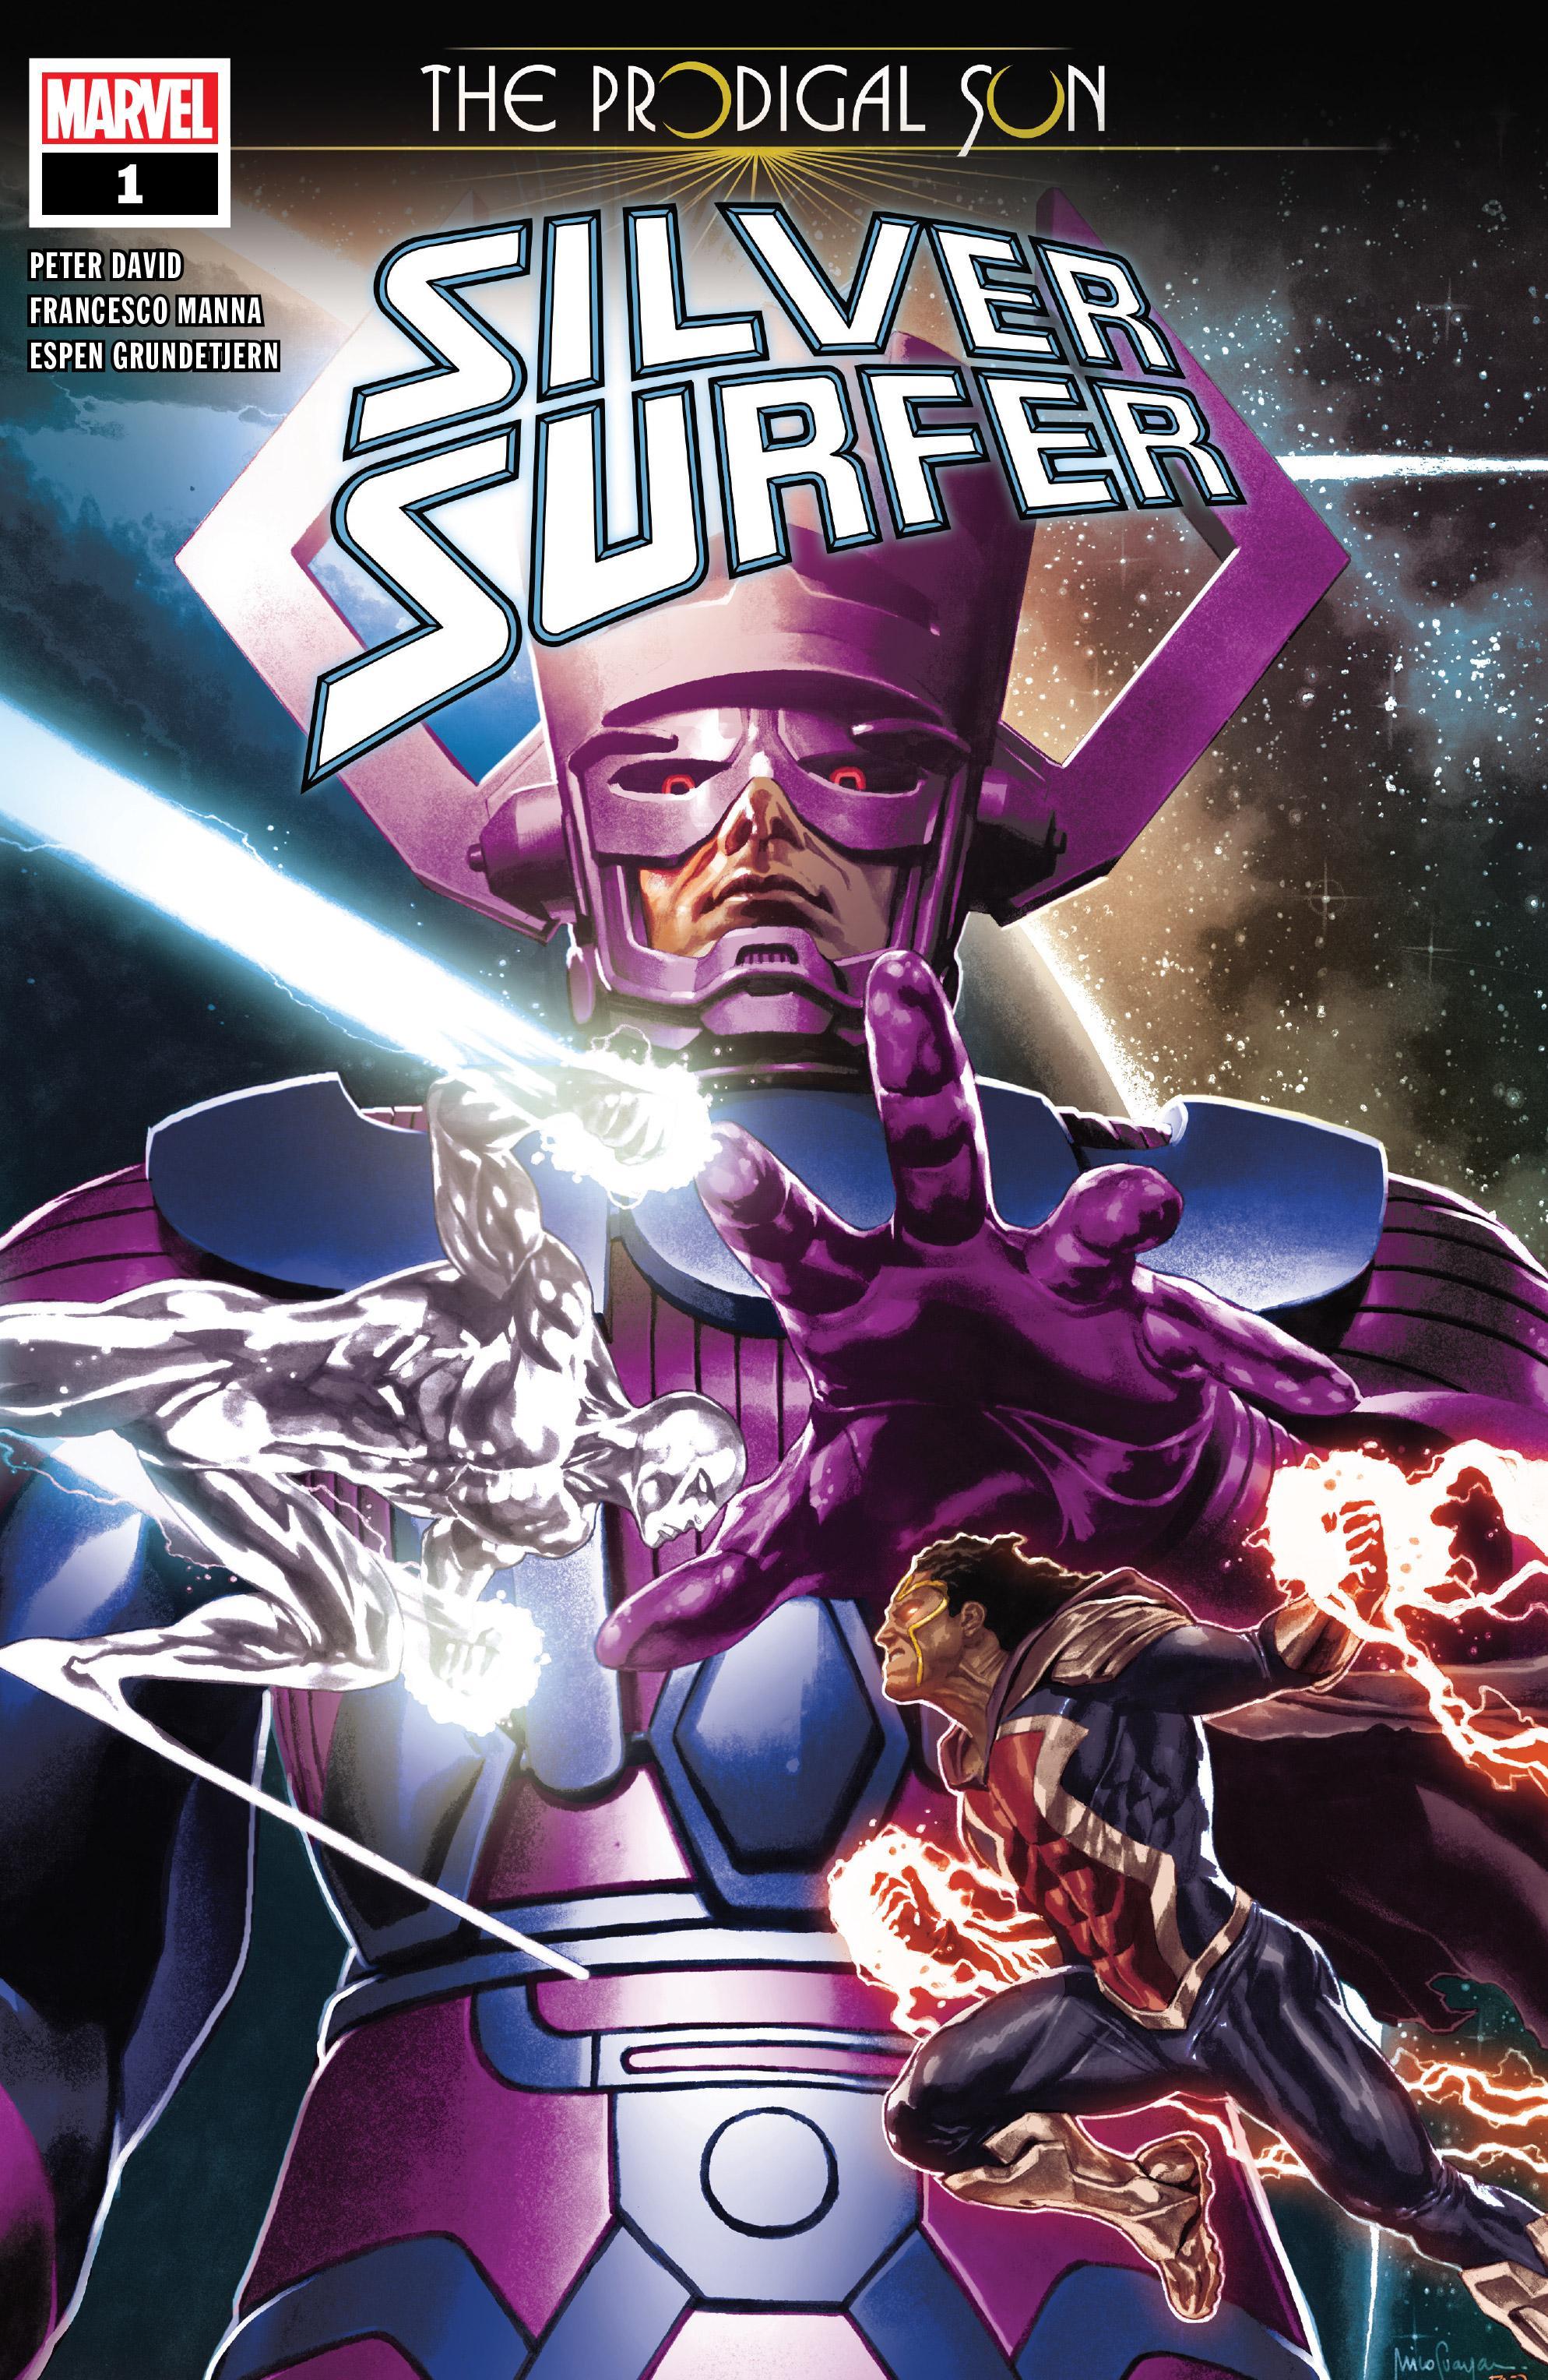 Silver Surfer-The Prodigal Sun 001 2019 Digital Zone